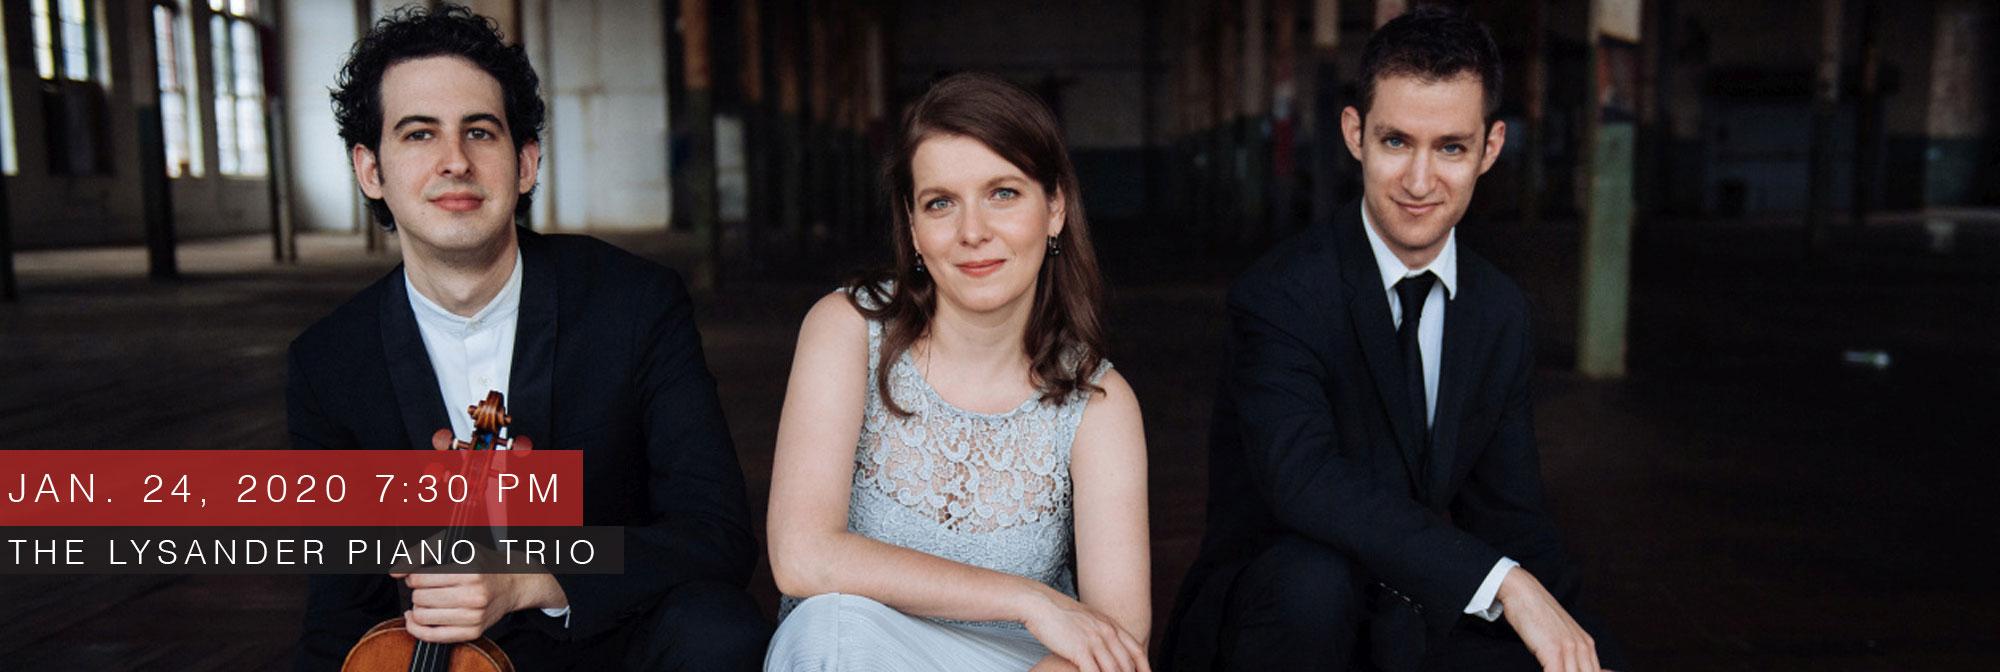 The-Lysander-Piano-Trio_MCMS.jpg